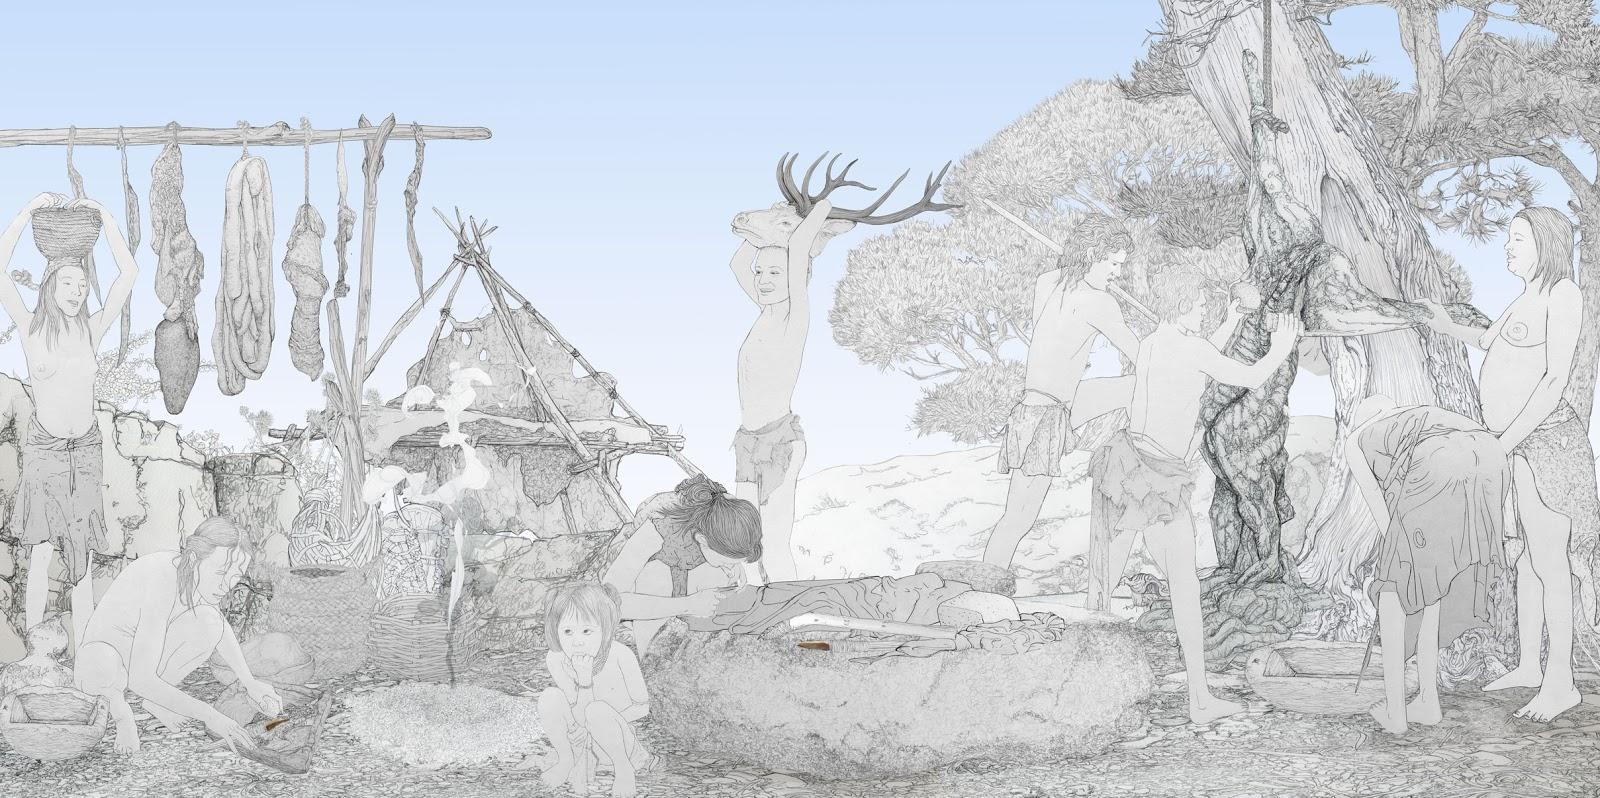 aprovechamiento de la caza, mujeres prehistoria, dibujo